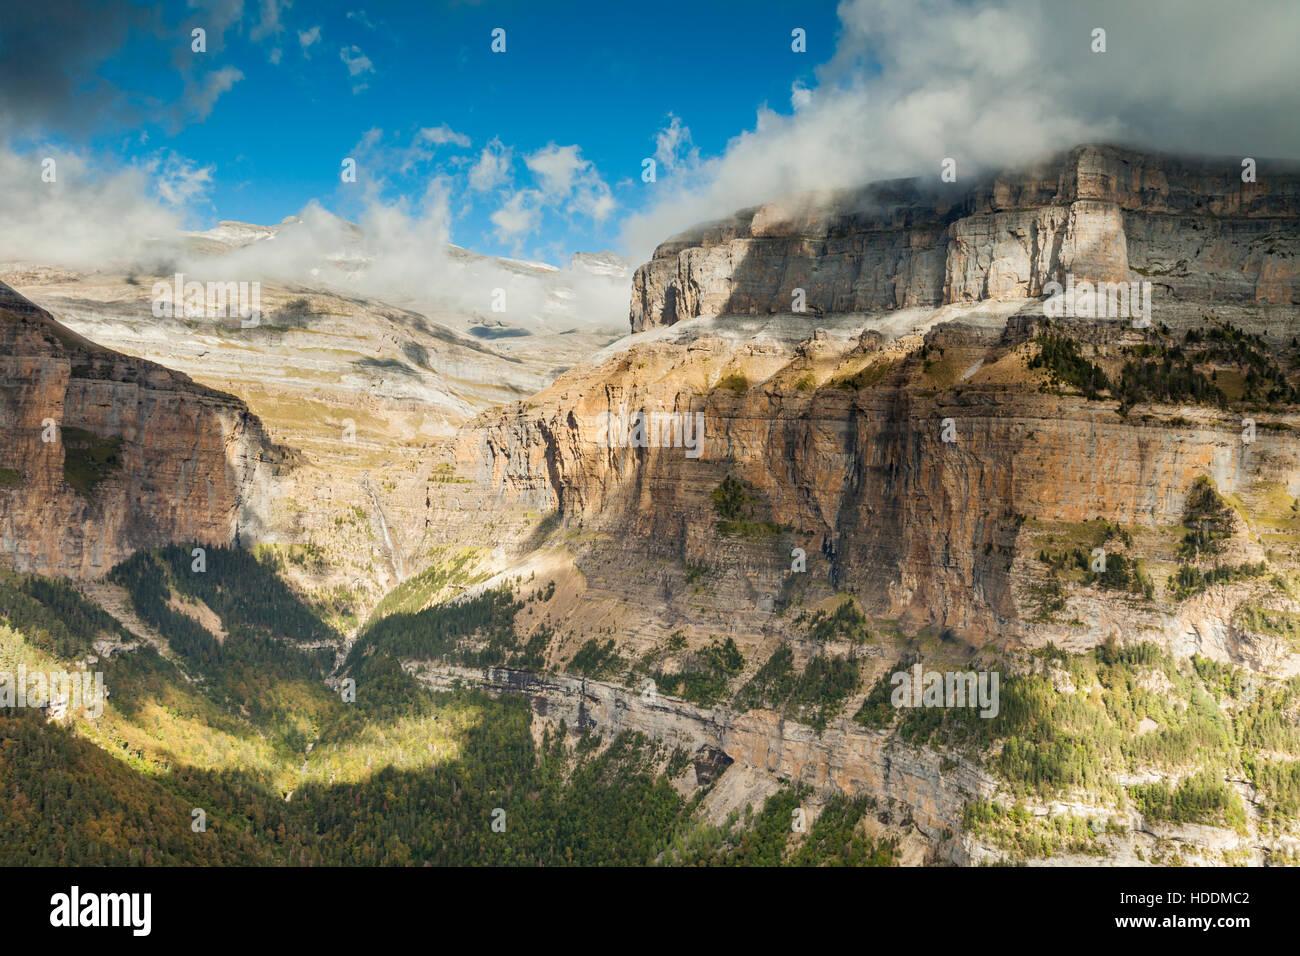 Herbst im Ordesa y Monte Perdido Nationalpark, Huesca, Aragon, Spanien, Pyrenäen. Stockbild